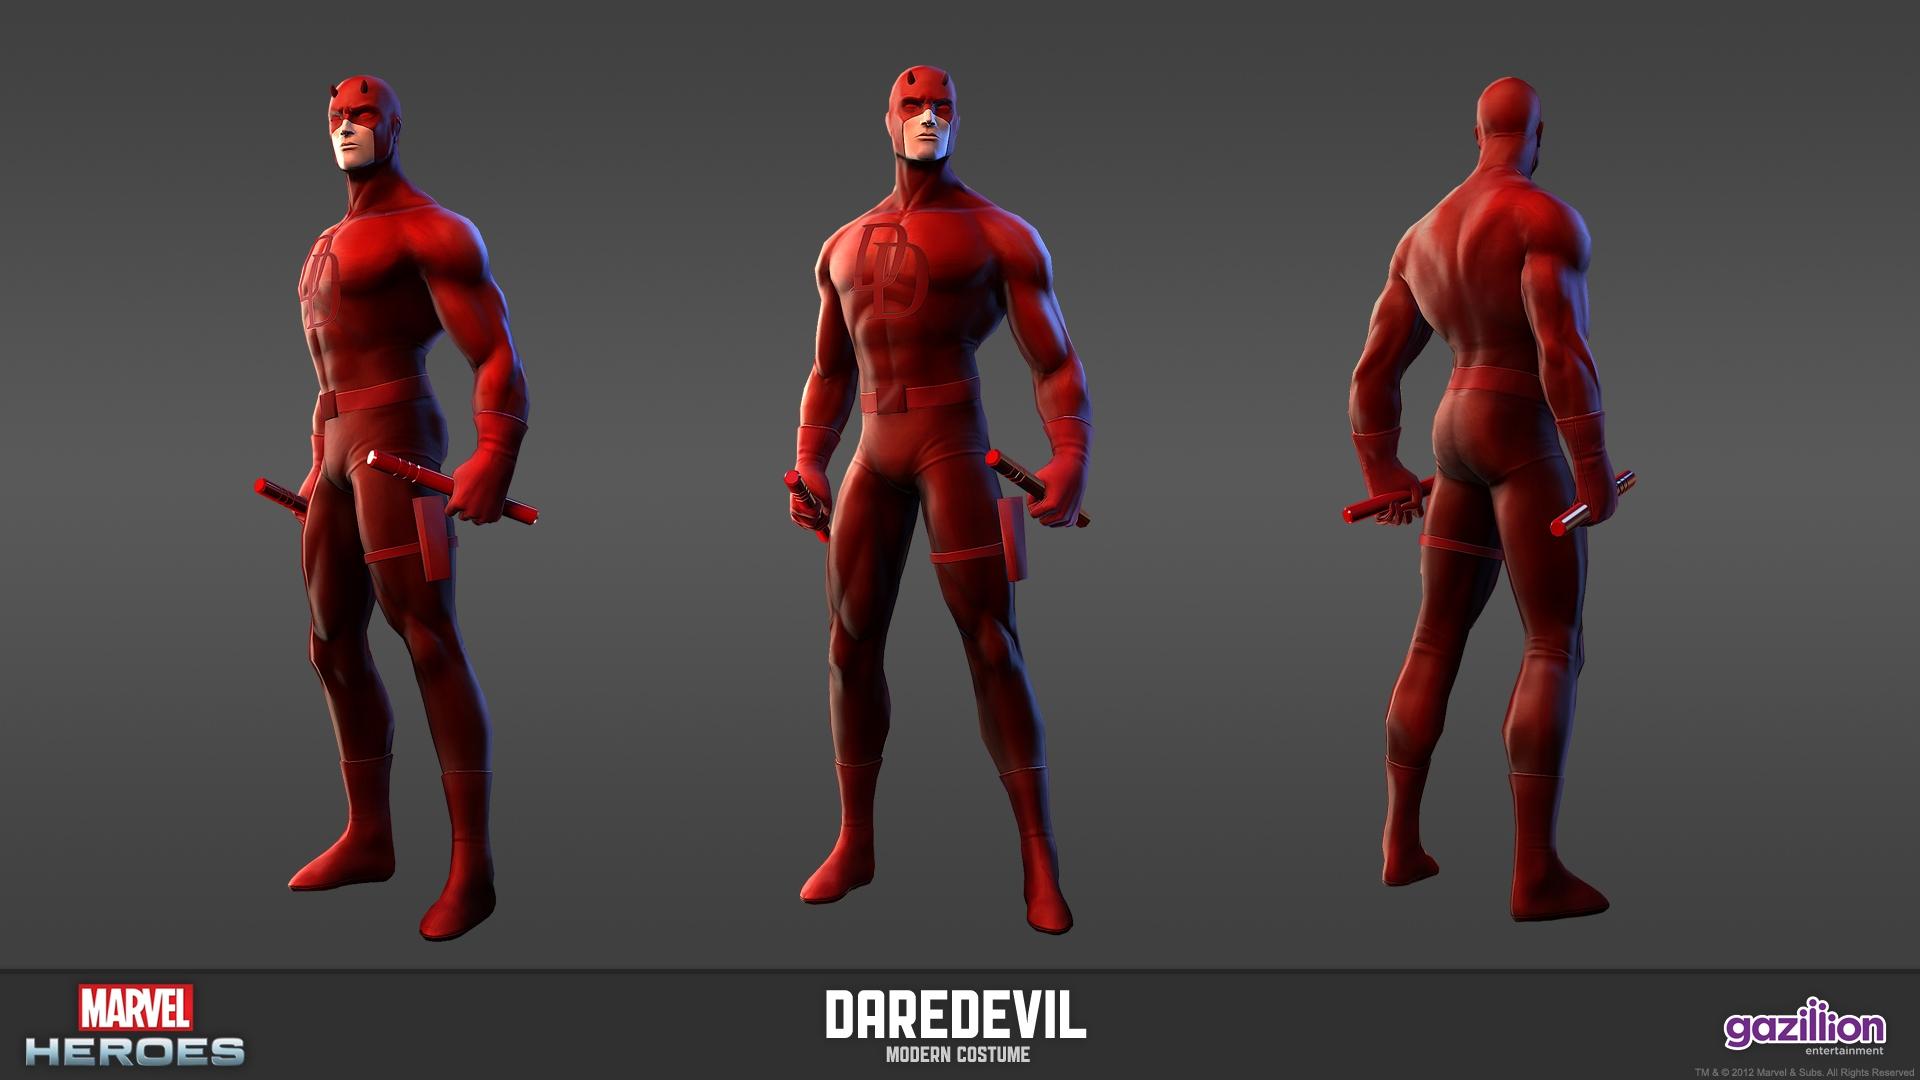 Marvel Heroes Daredevil Wallpaper